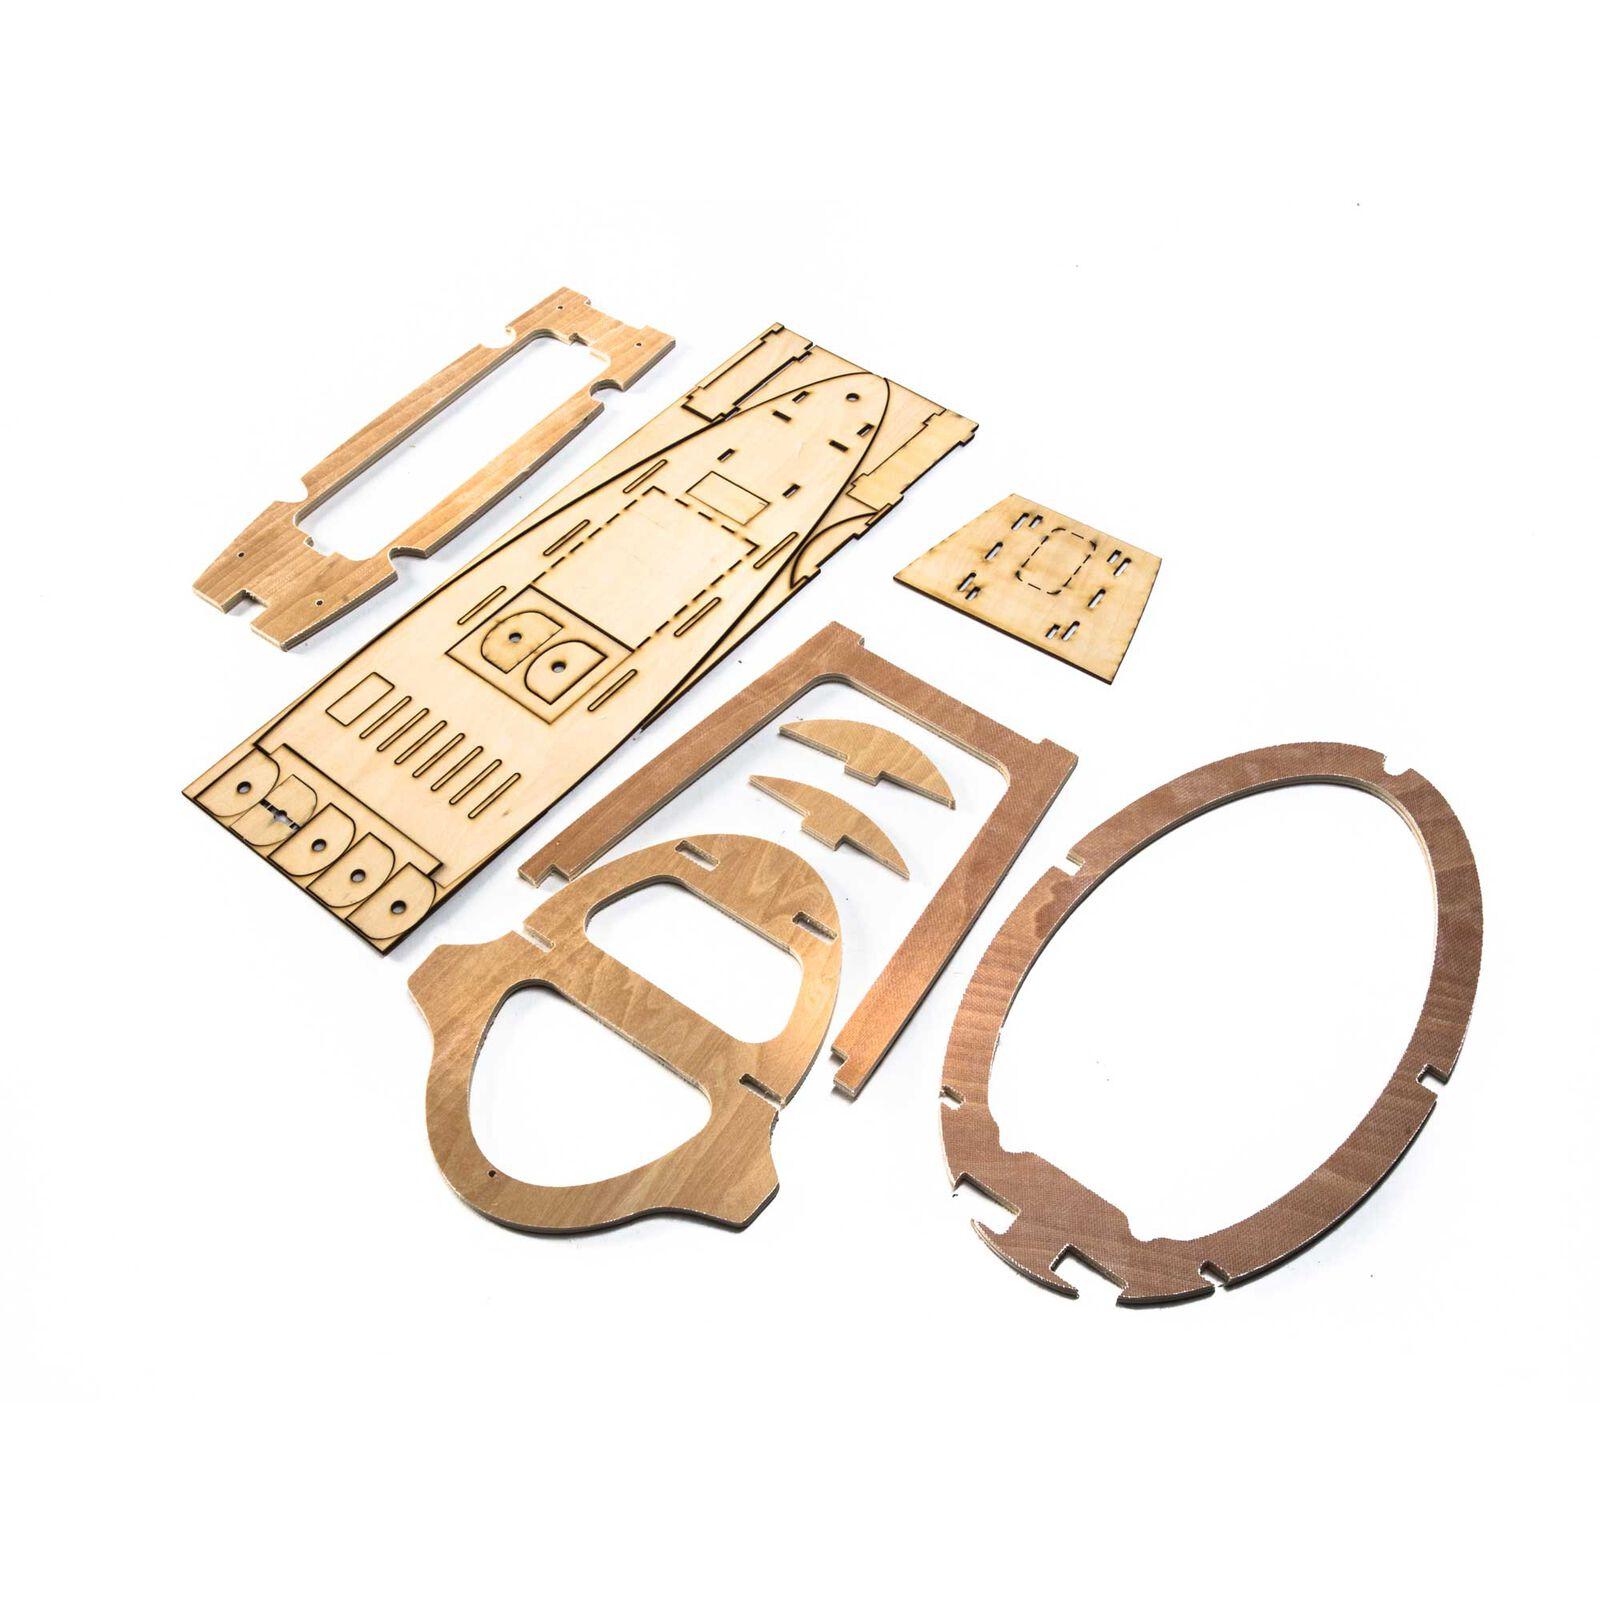 Plywood Landing Gear Parts: ASH 31 6.4m